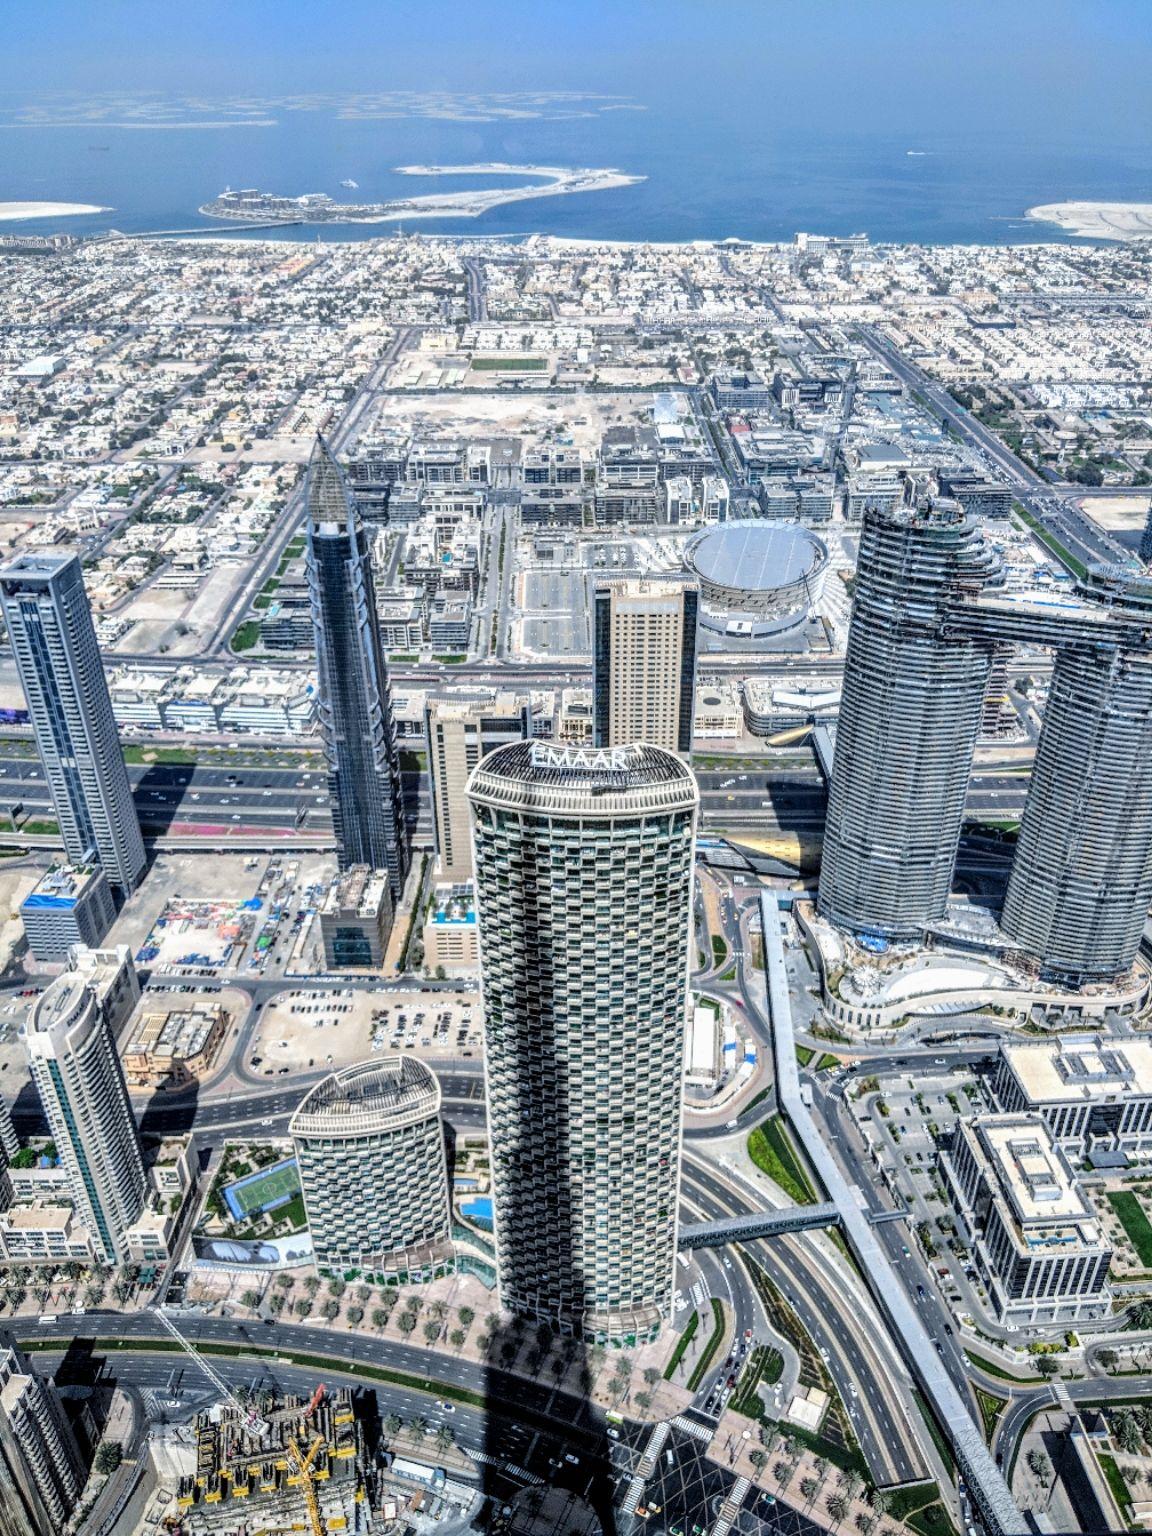 Photo of Dubai - United Arab Emirates By Sylvania D'Souza